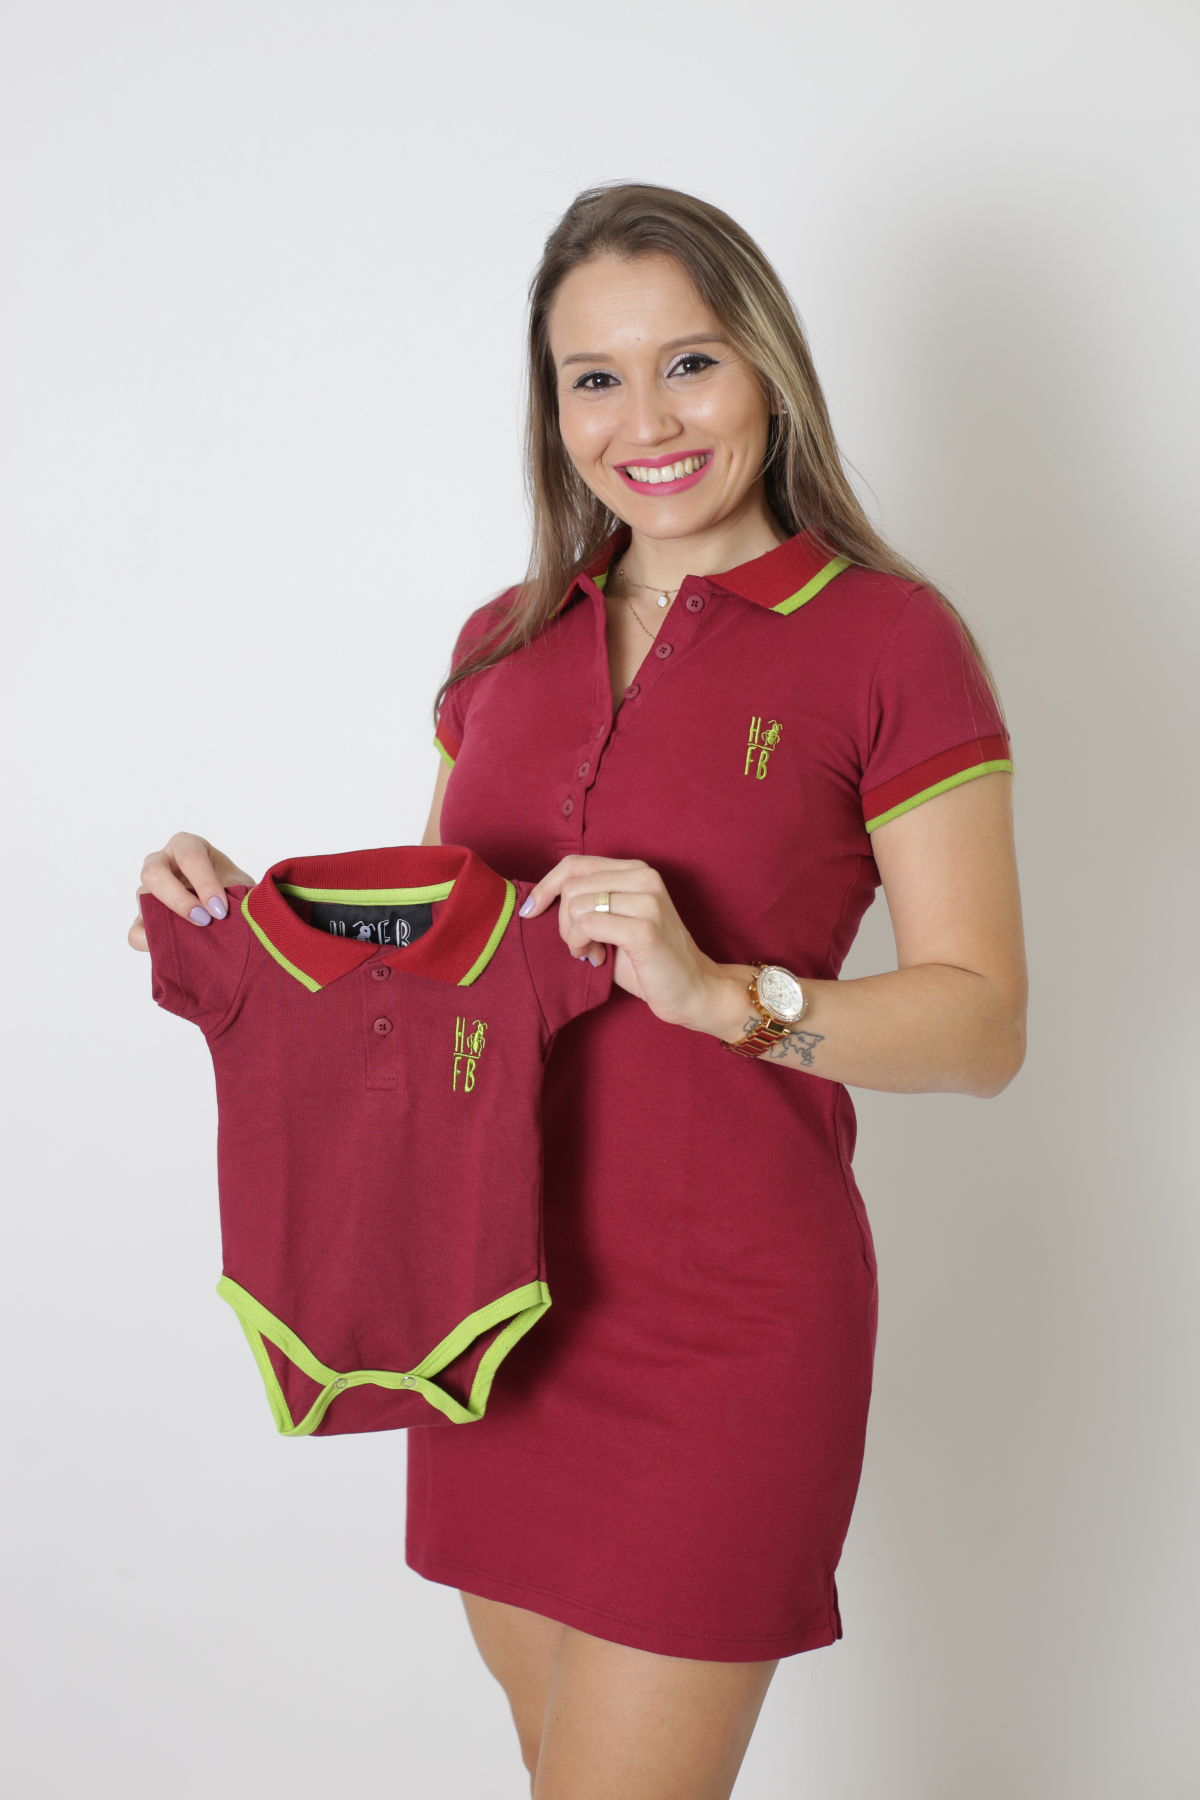 MÃE E FILHO > Kit 02 peças Vestido + Body Unissex Polo - Bordo [Coleção Tal Mãe Tal Filho]